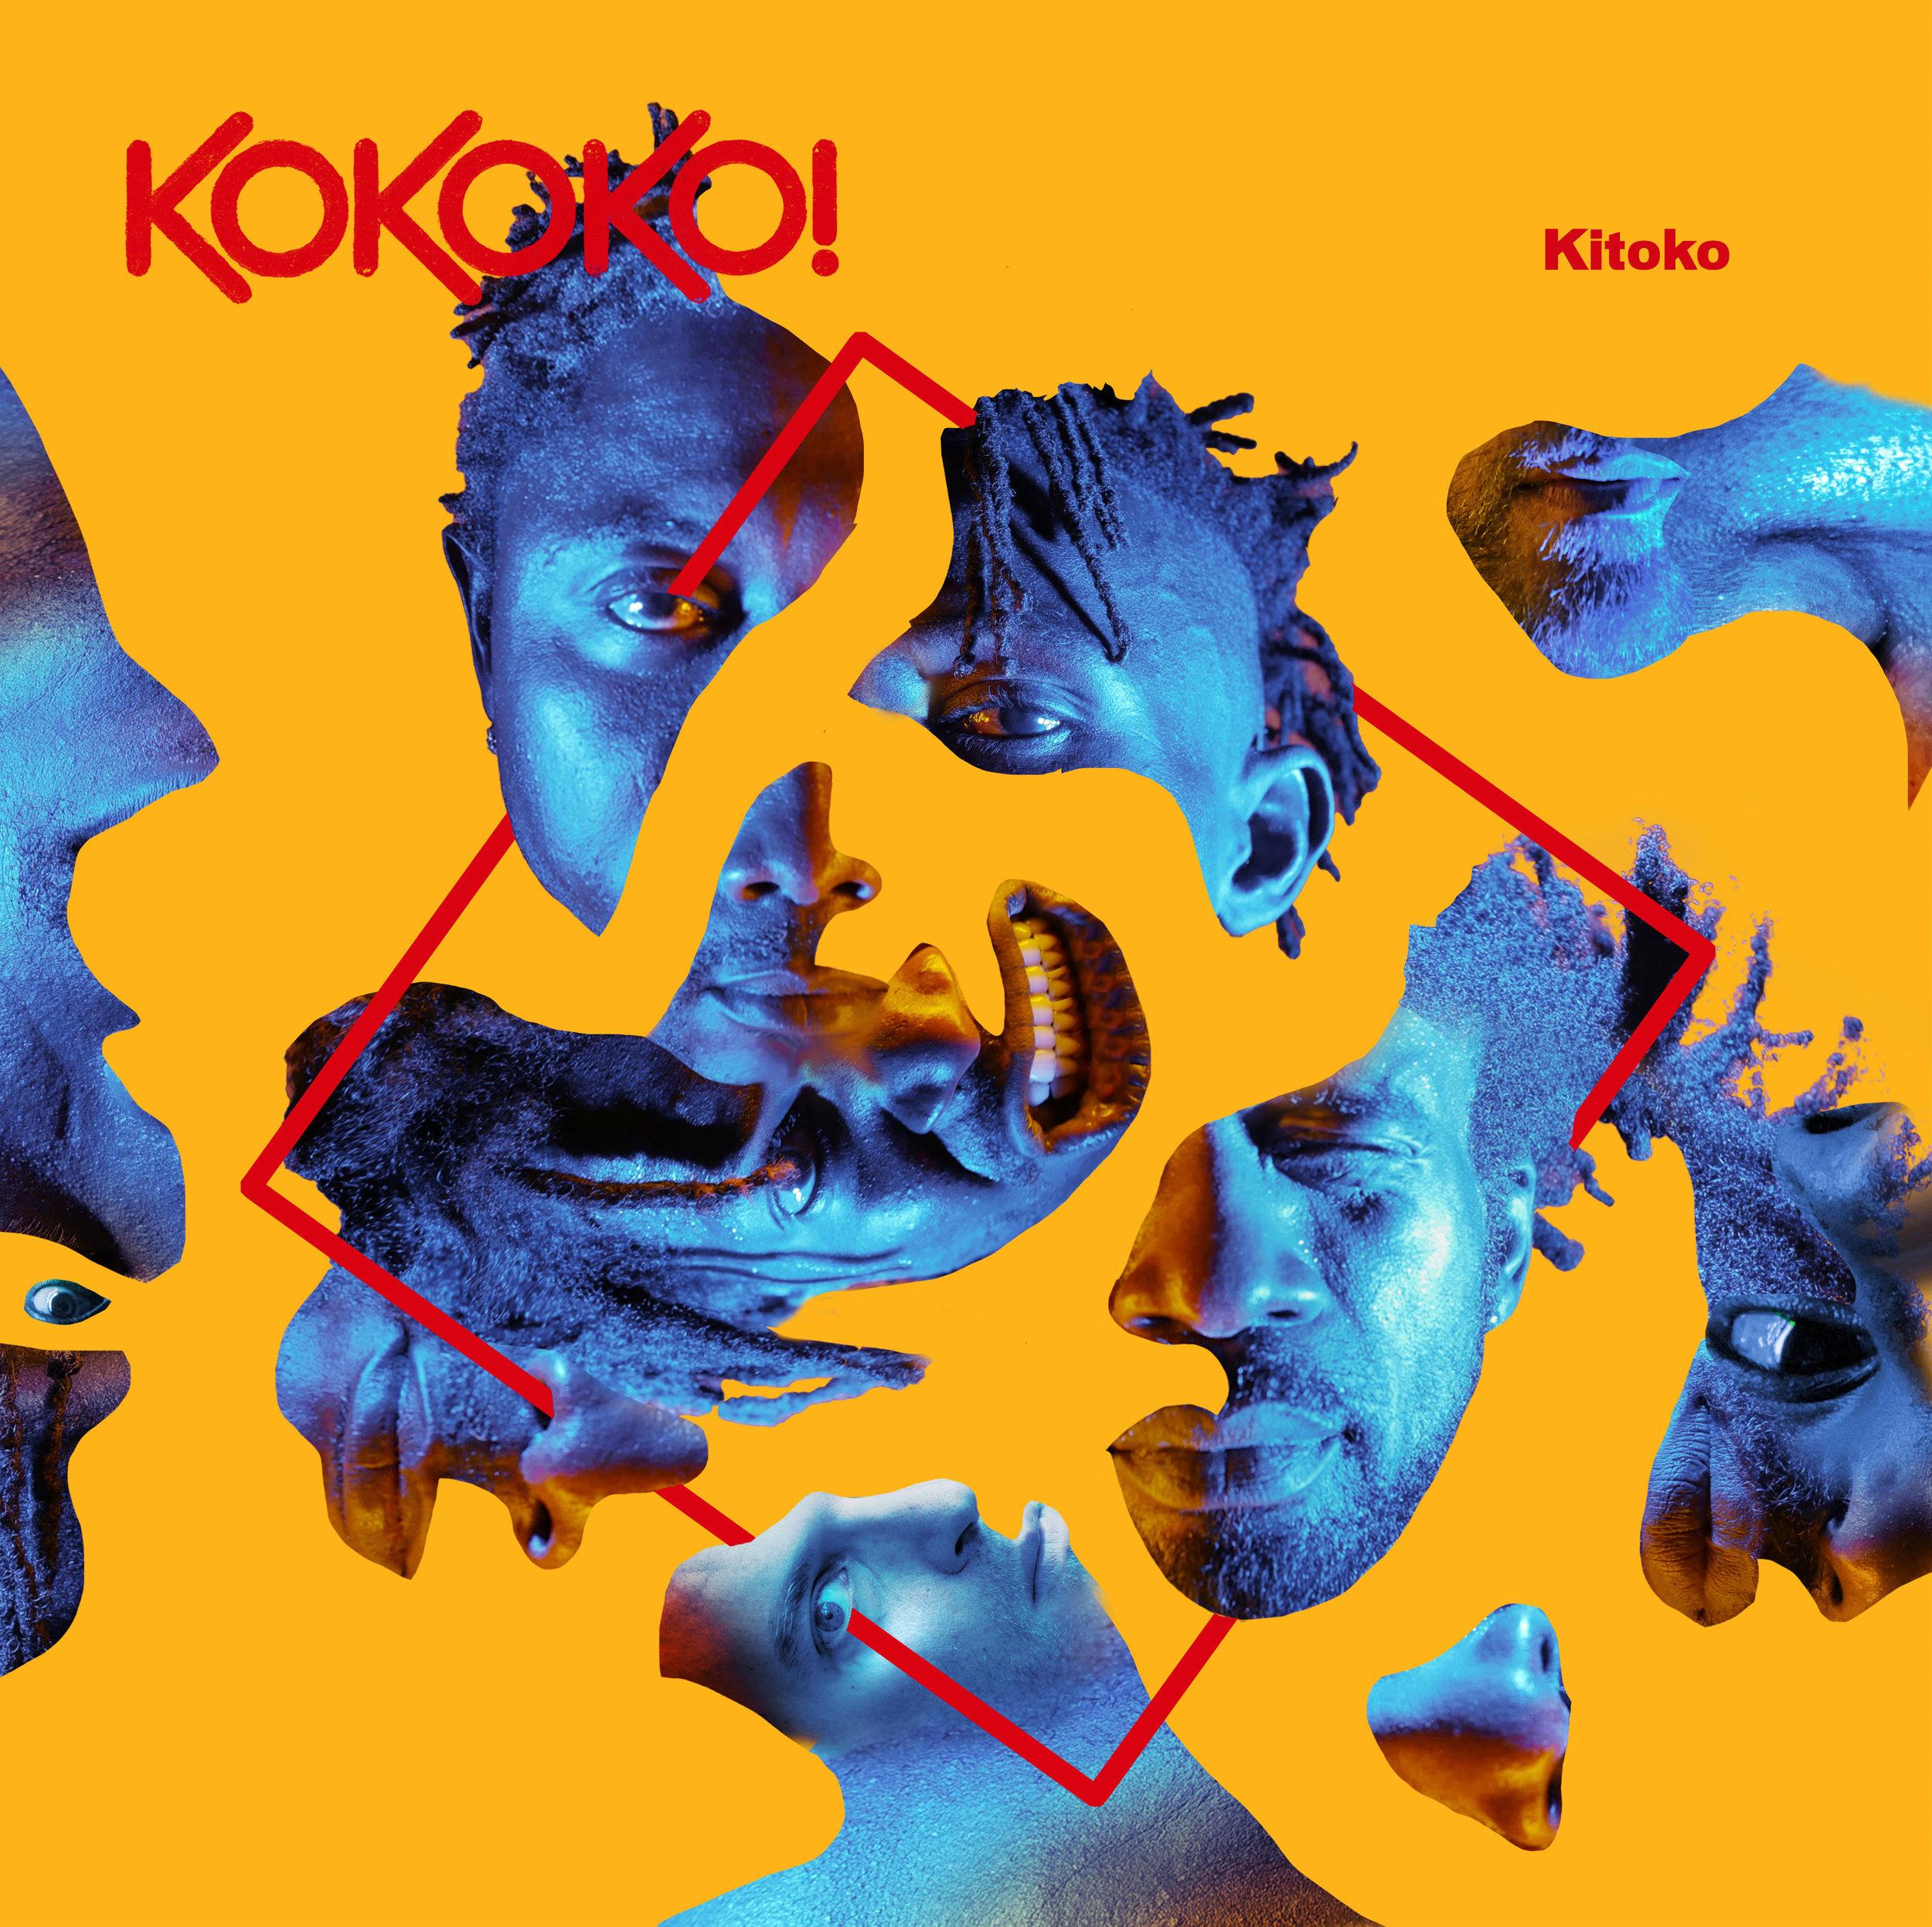 KOKOKO! - Kitoko Arwork.jpg